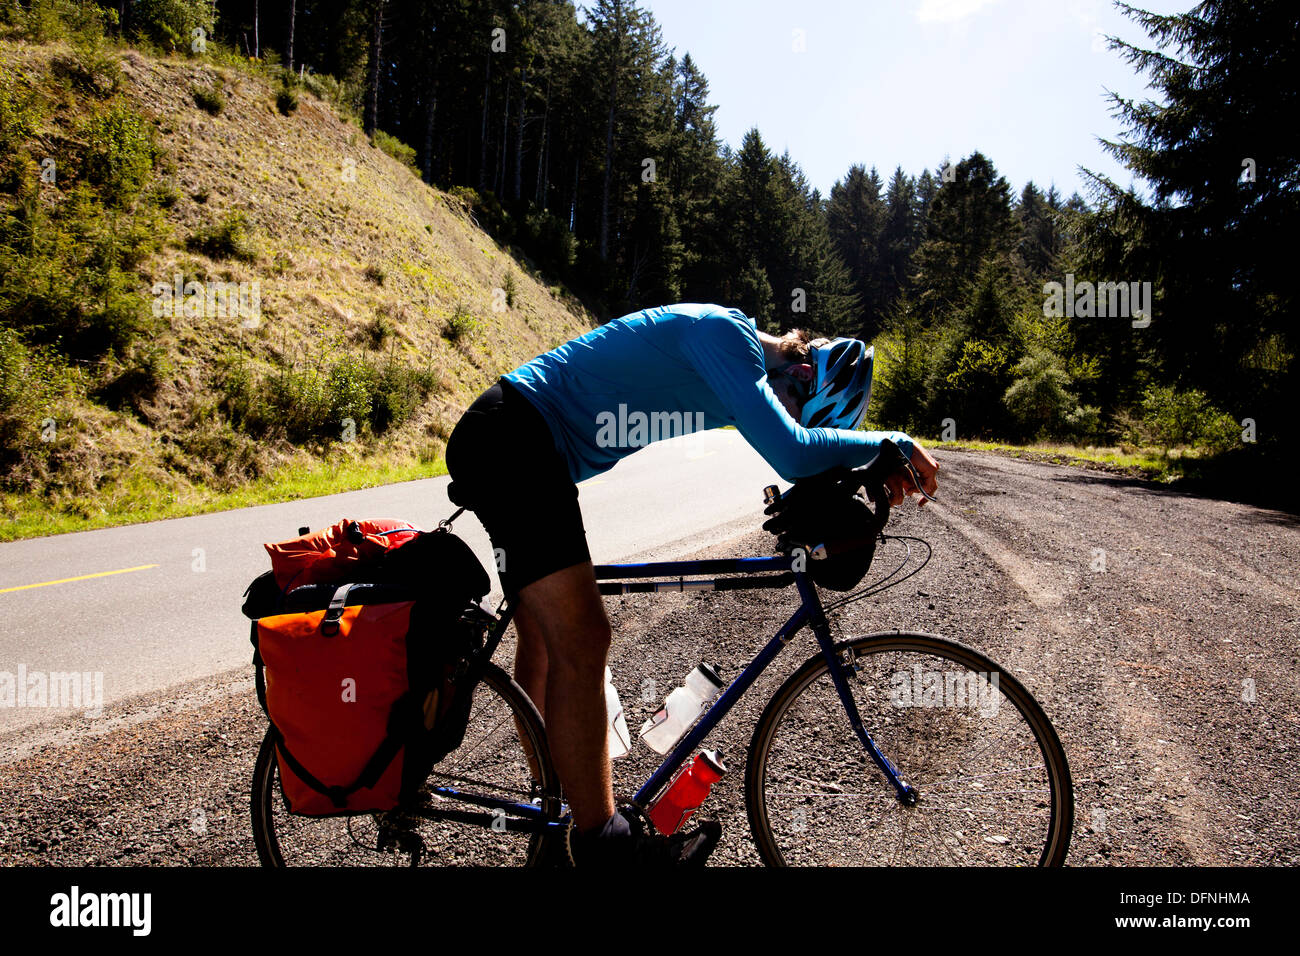 Un ciclista exhausto se inclina sobre su bicicleta de touring mientras subía Mattole Road, cerca de Ferndale, California. Imagen De Stock